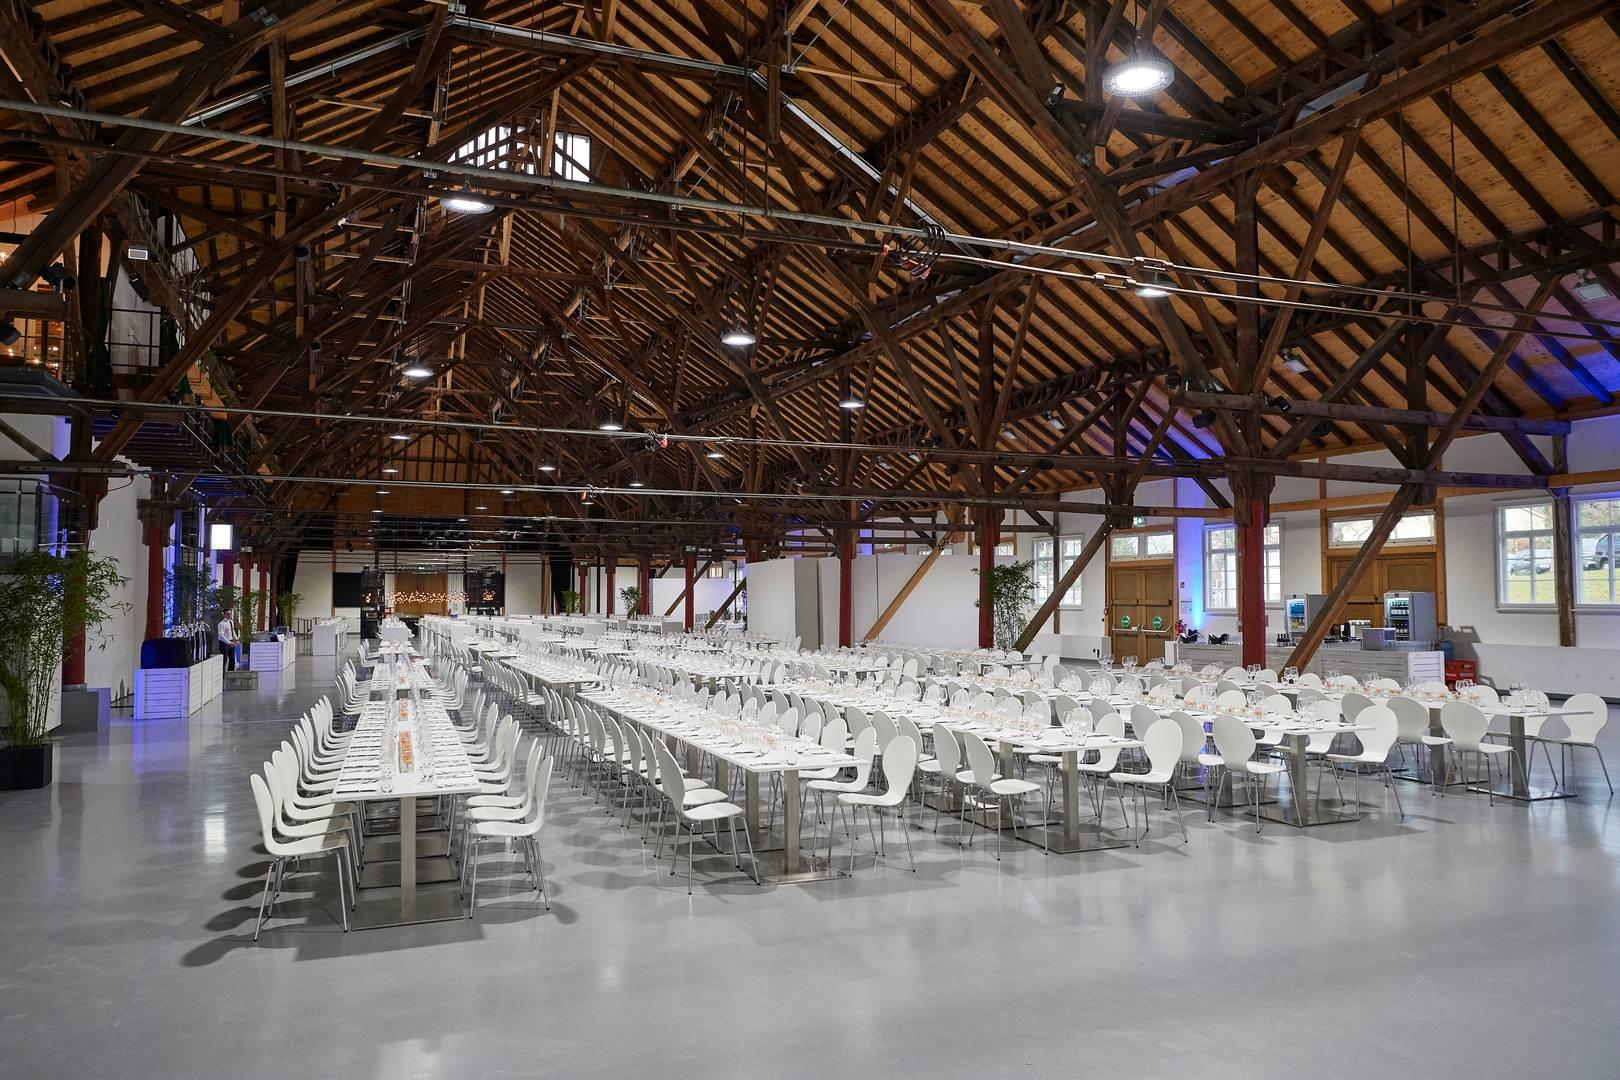 Alte Kelter Veranstaltung Fiylo